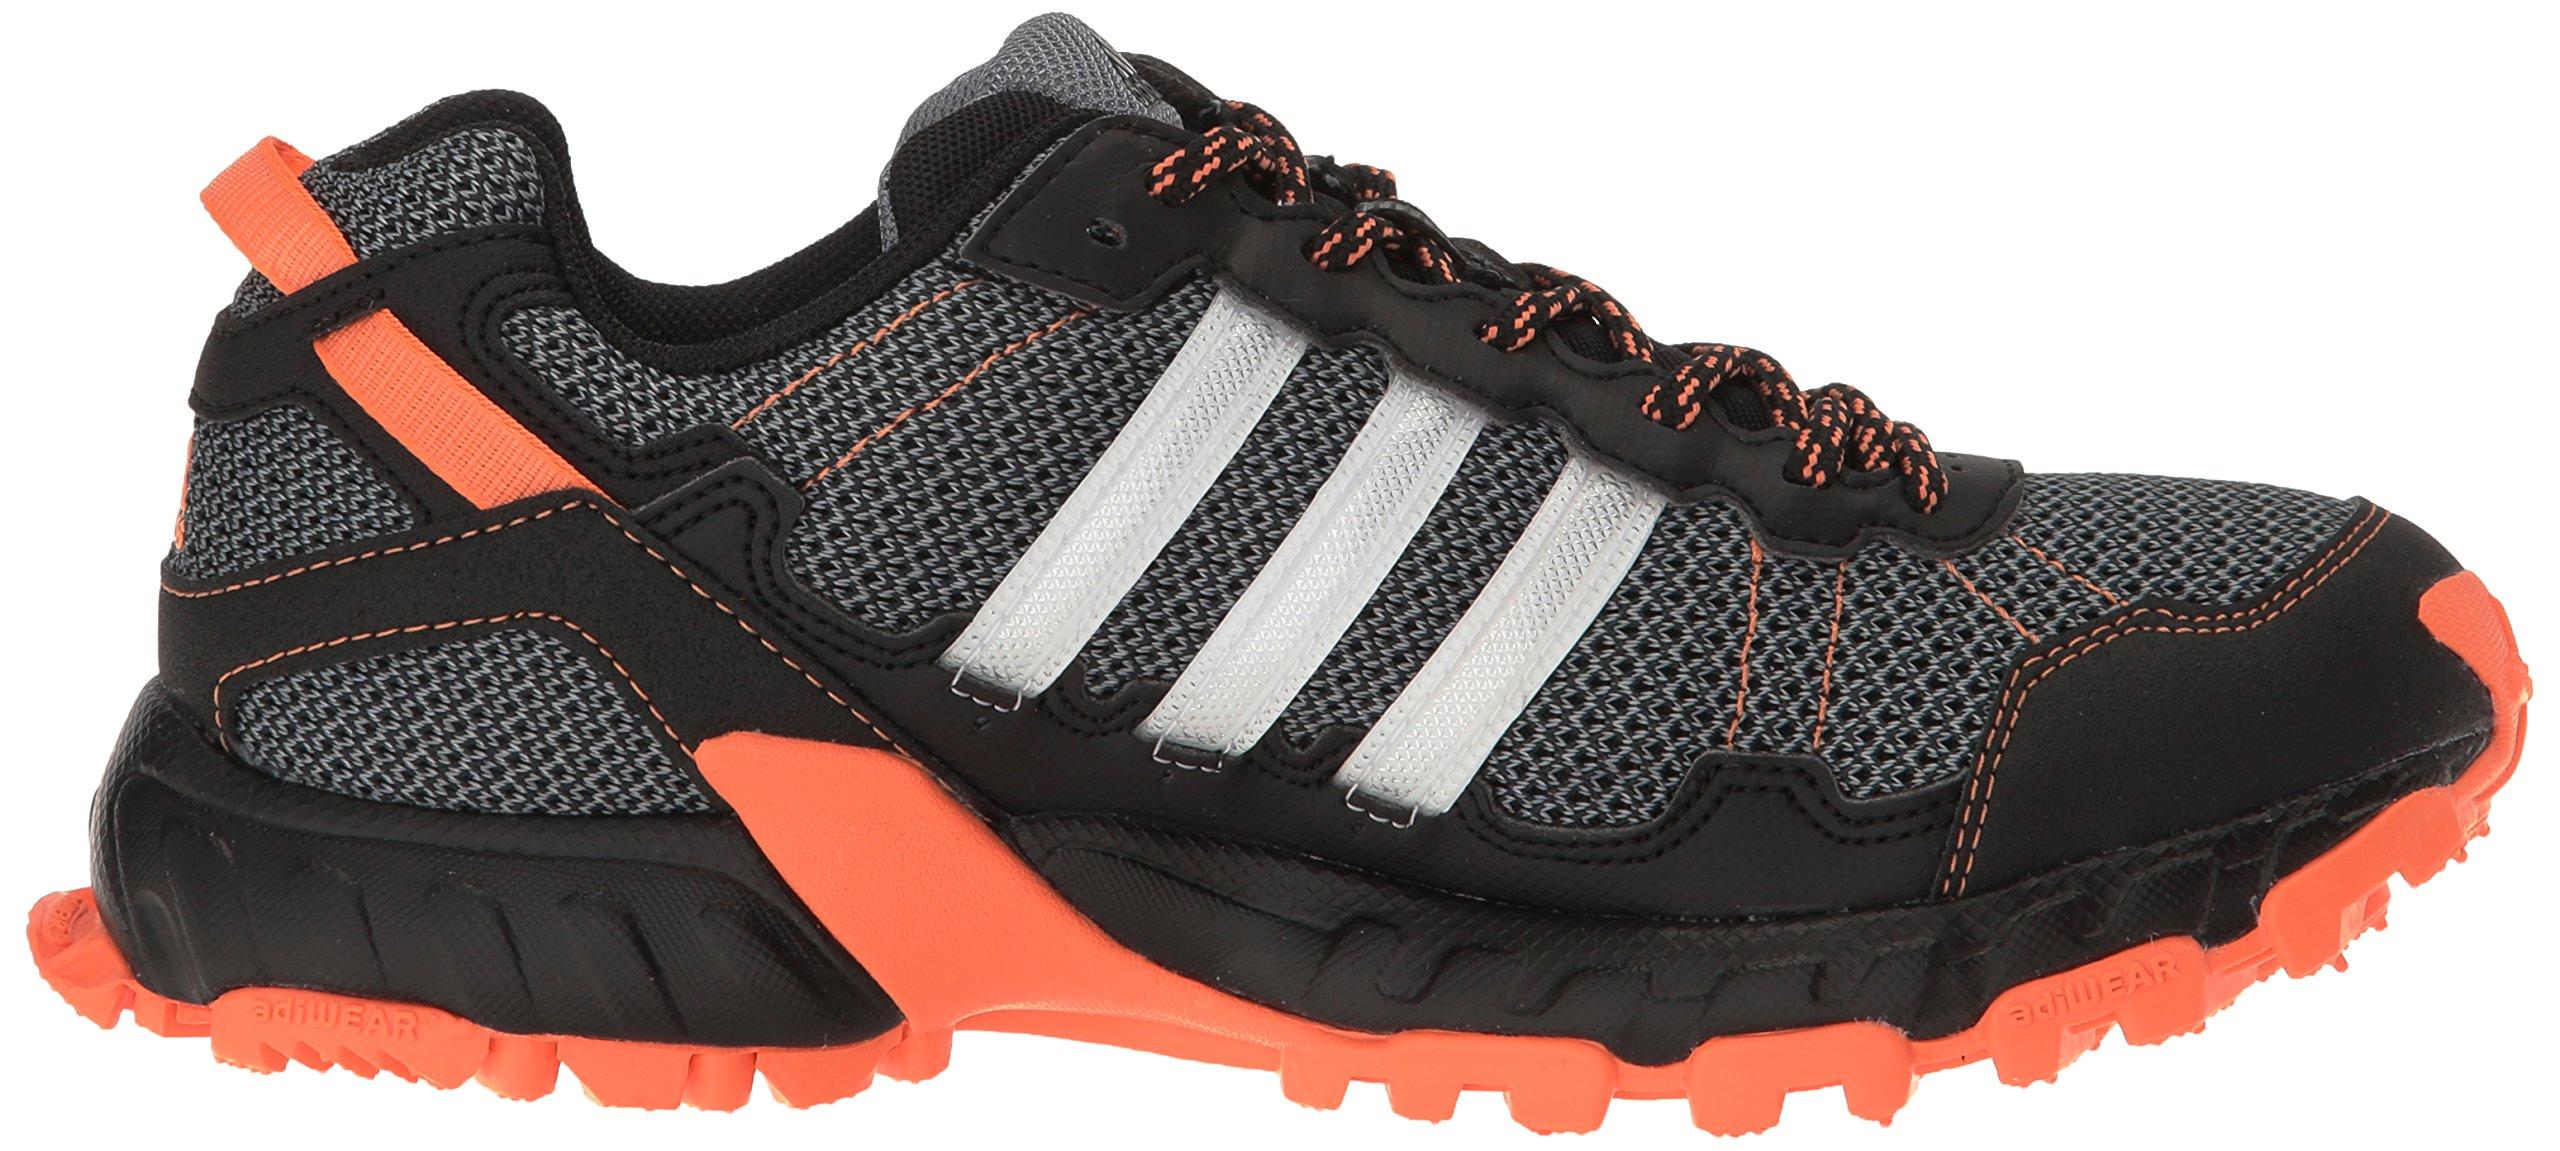 adidas Women's Rockadia Trail W Running Shoe Black/White/Easy Orange 6 M US by adidas (Image #7)